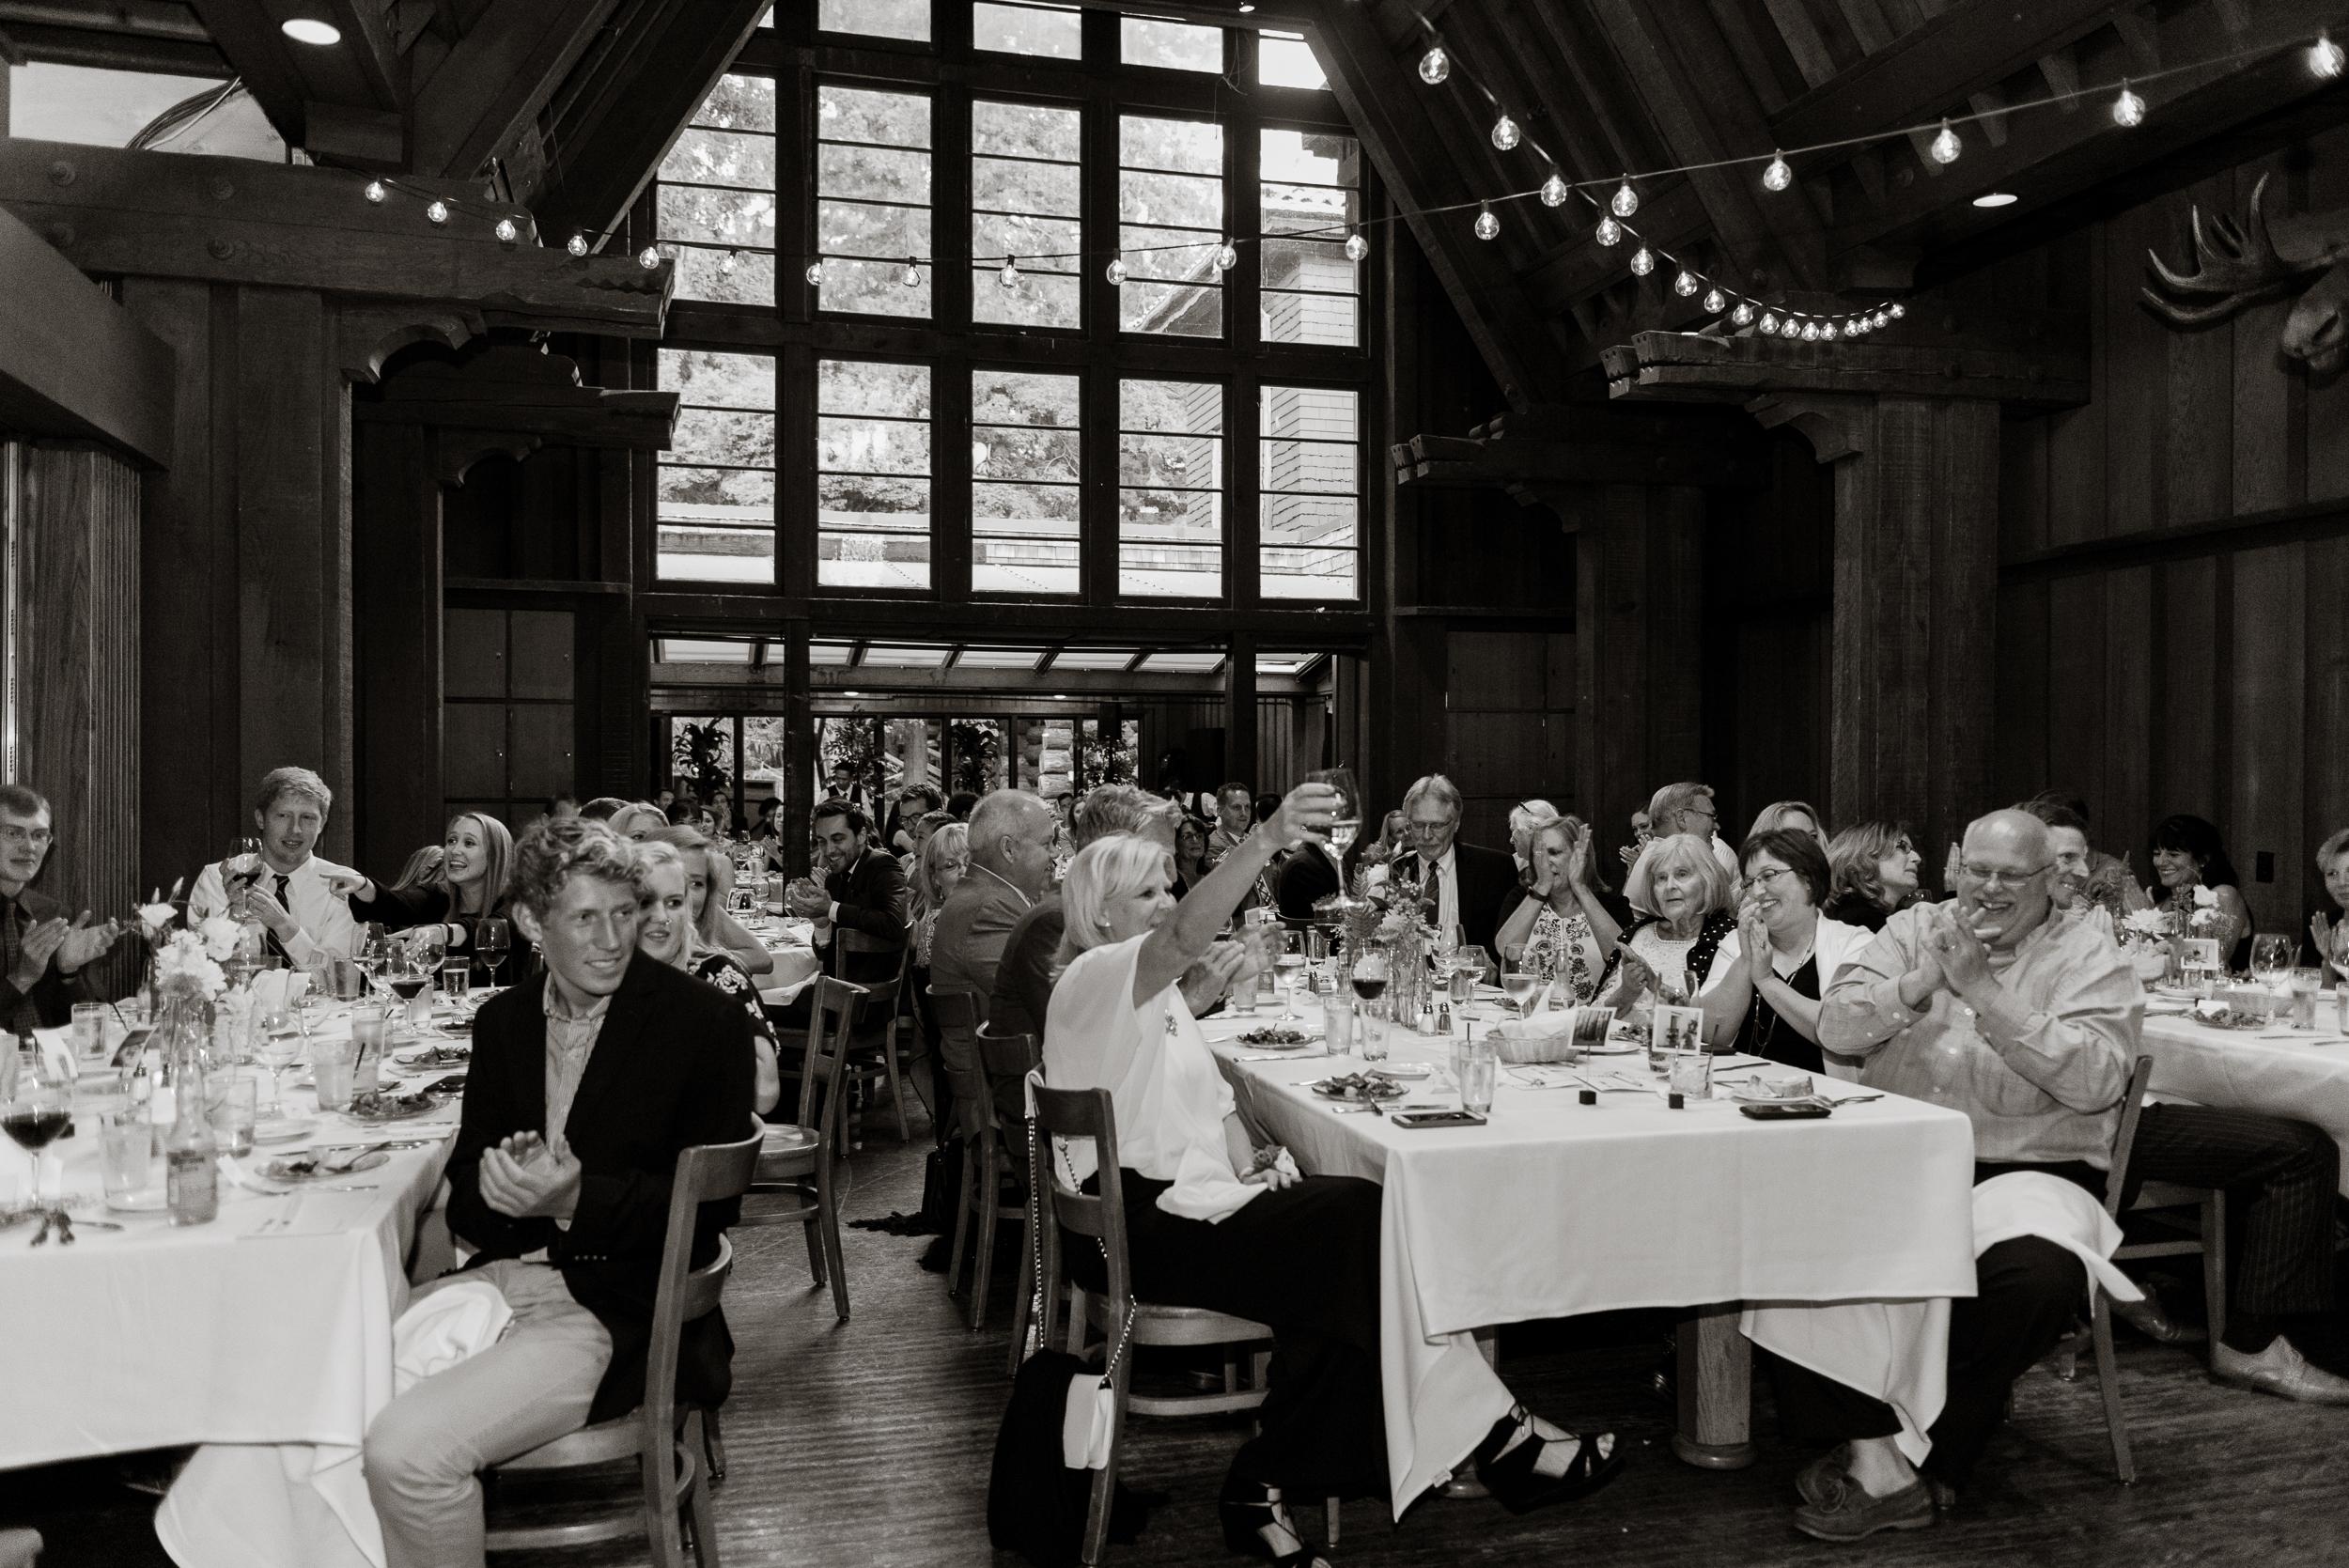 faculty-club-berkeley-wedding-photographer-vc073.jpg